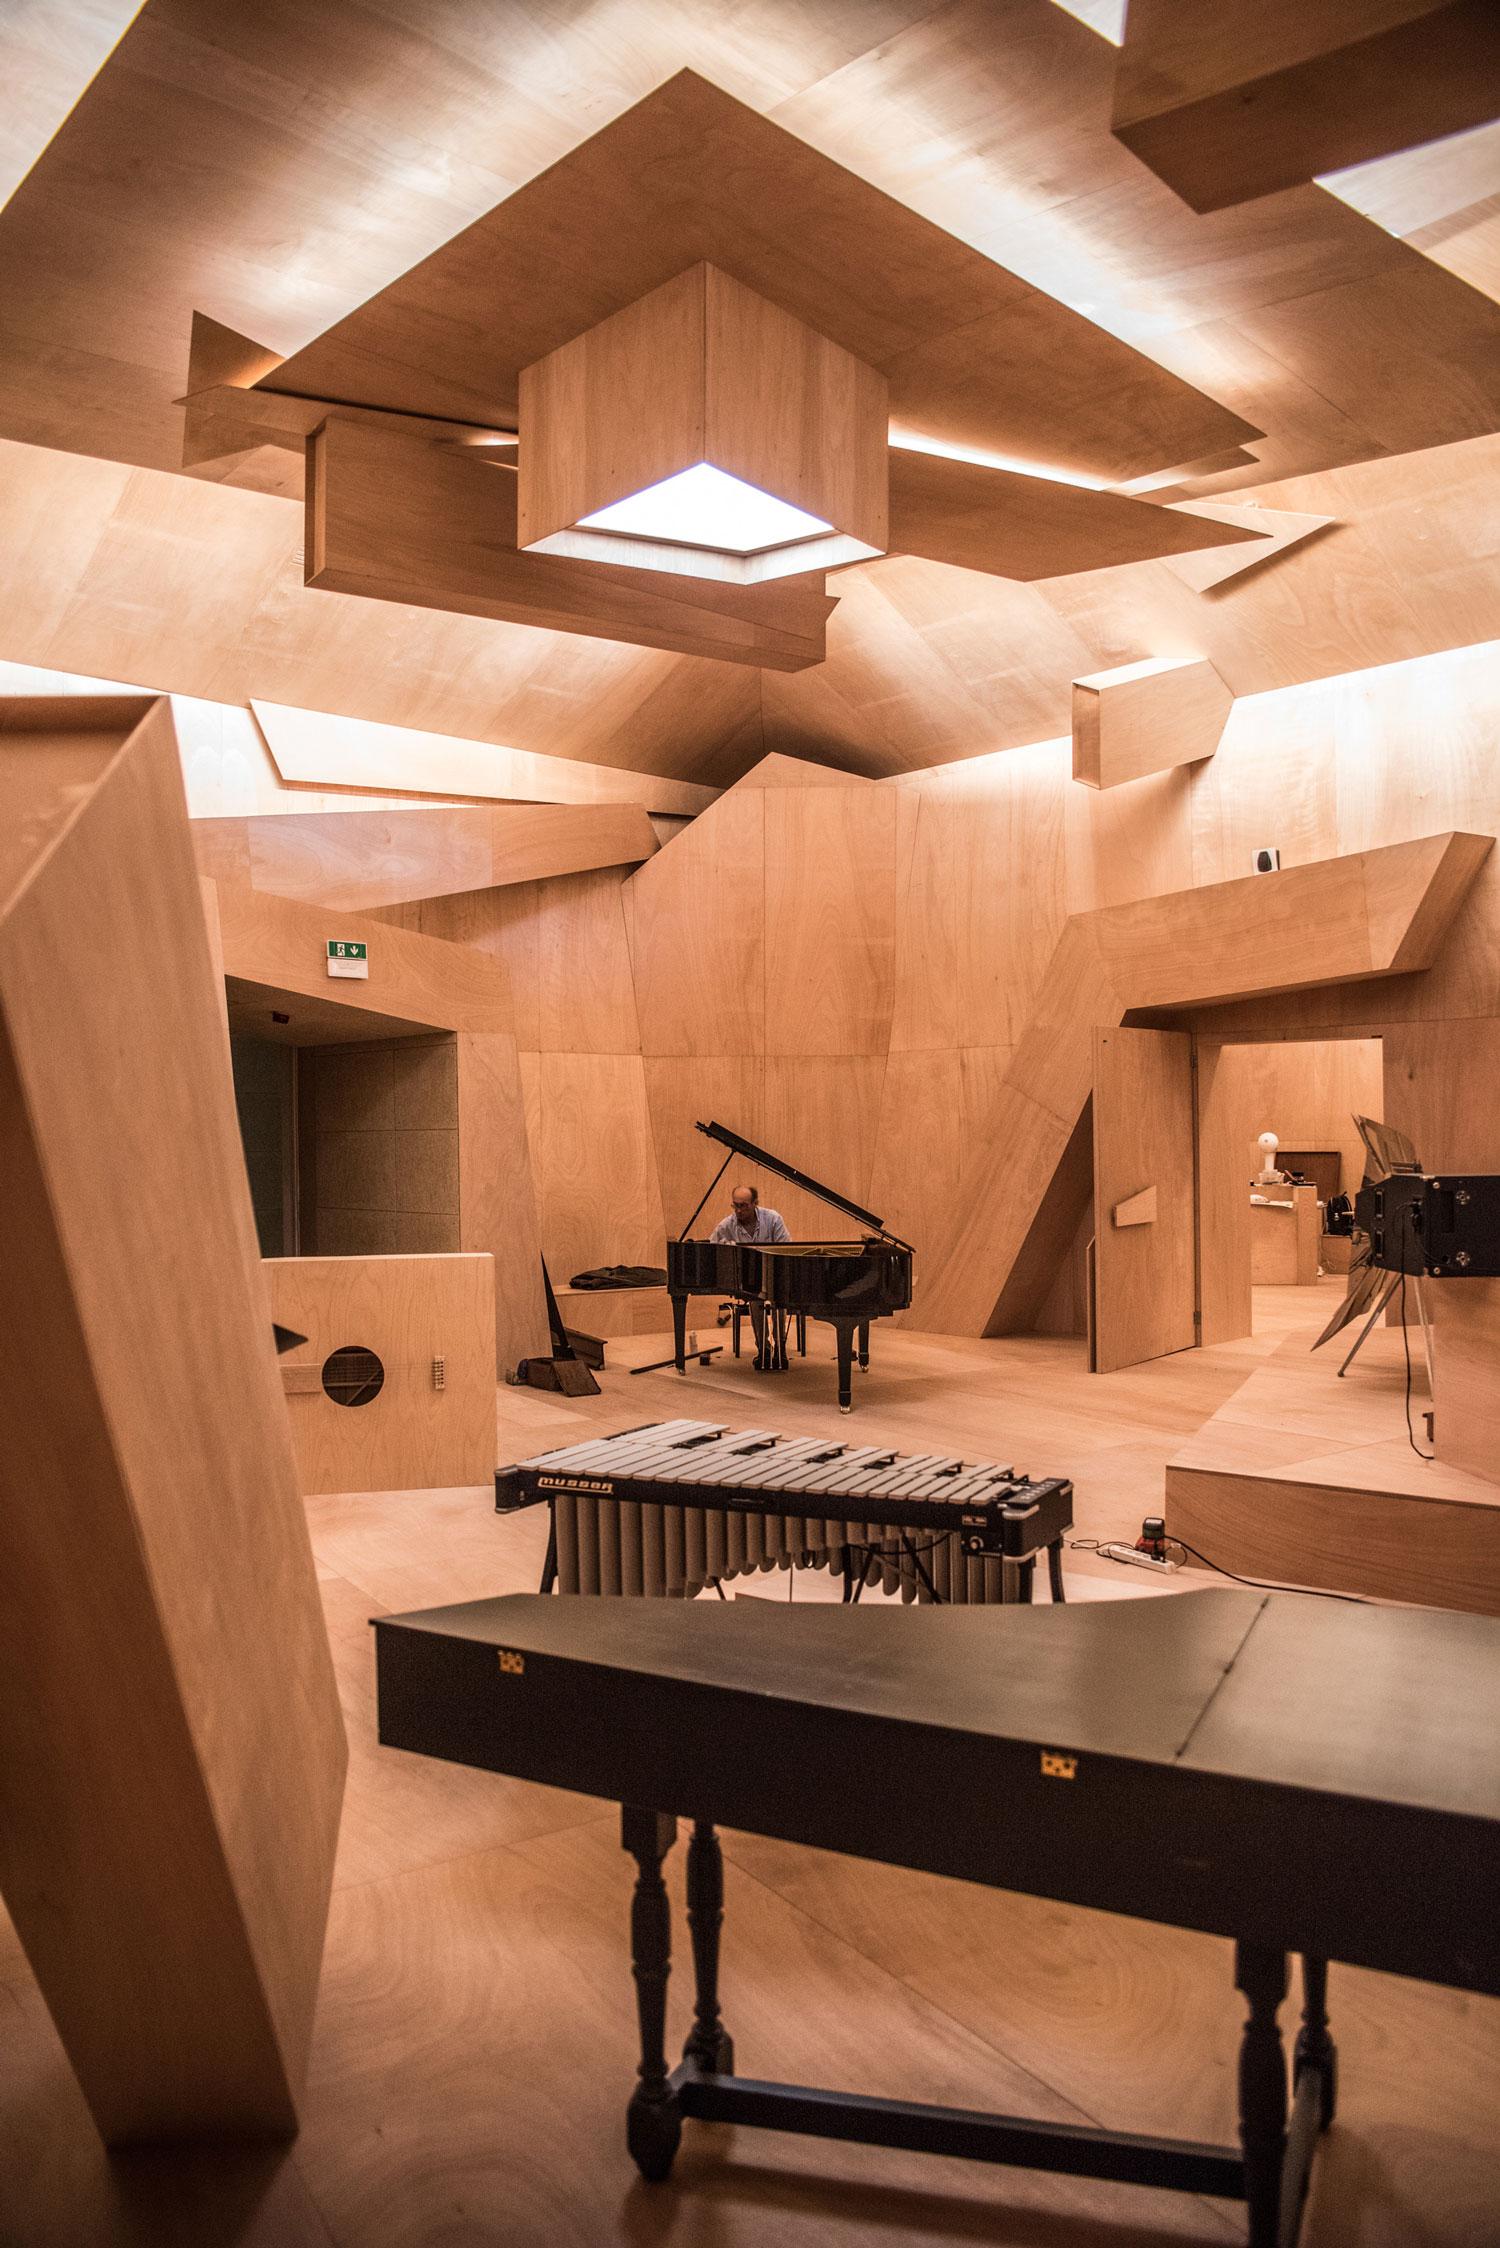 France Pavillion by Studio Venezia, Recording Studio by Xavier Veilhan at Venice Biennale 2017   Yellowtrace